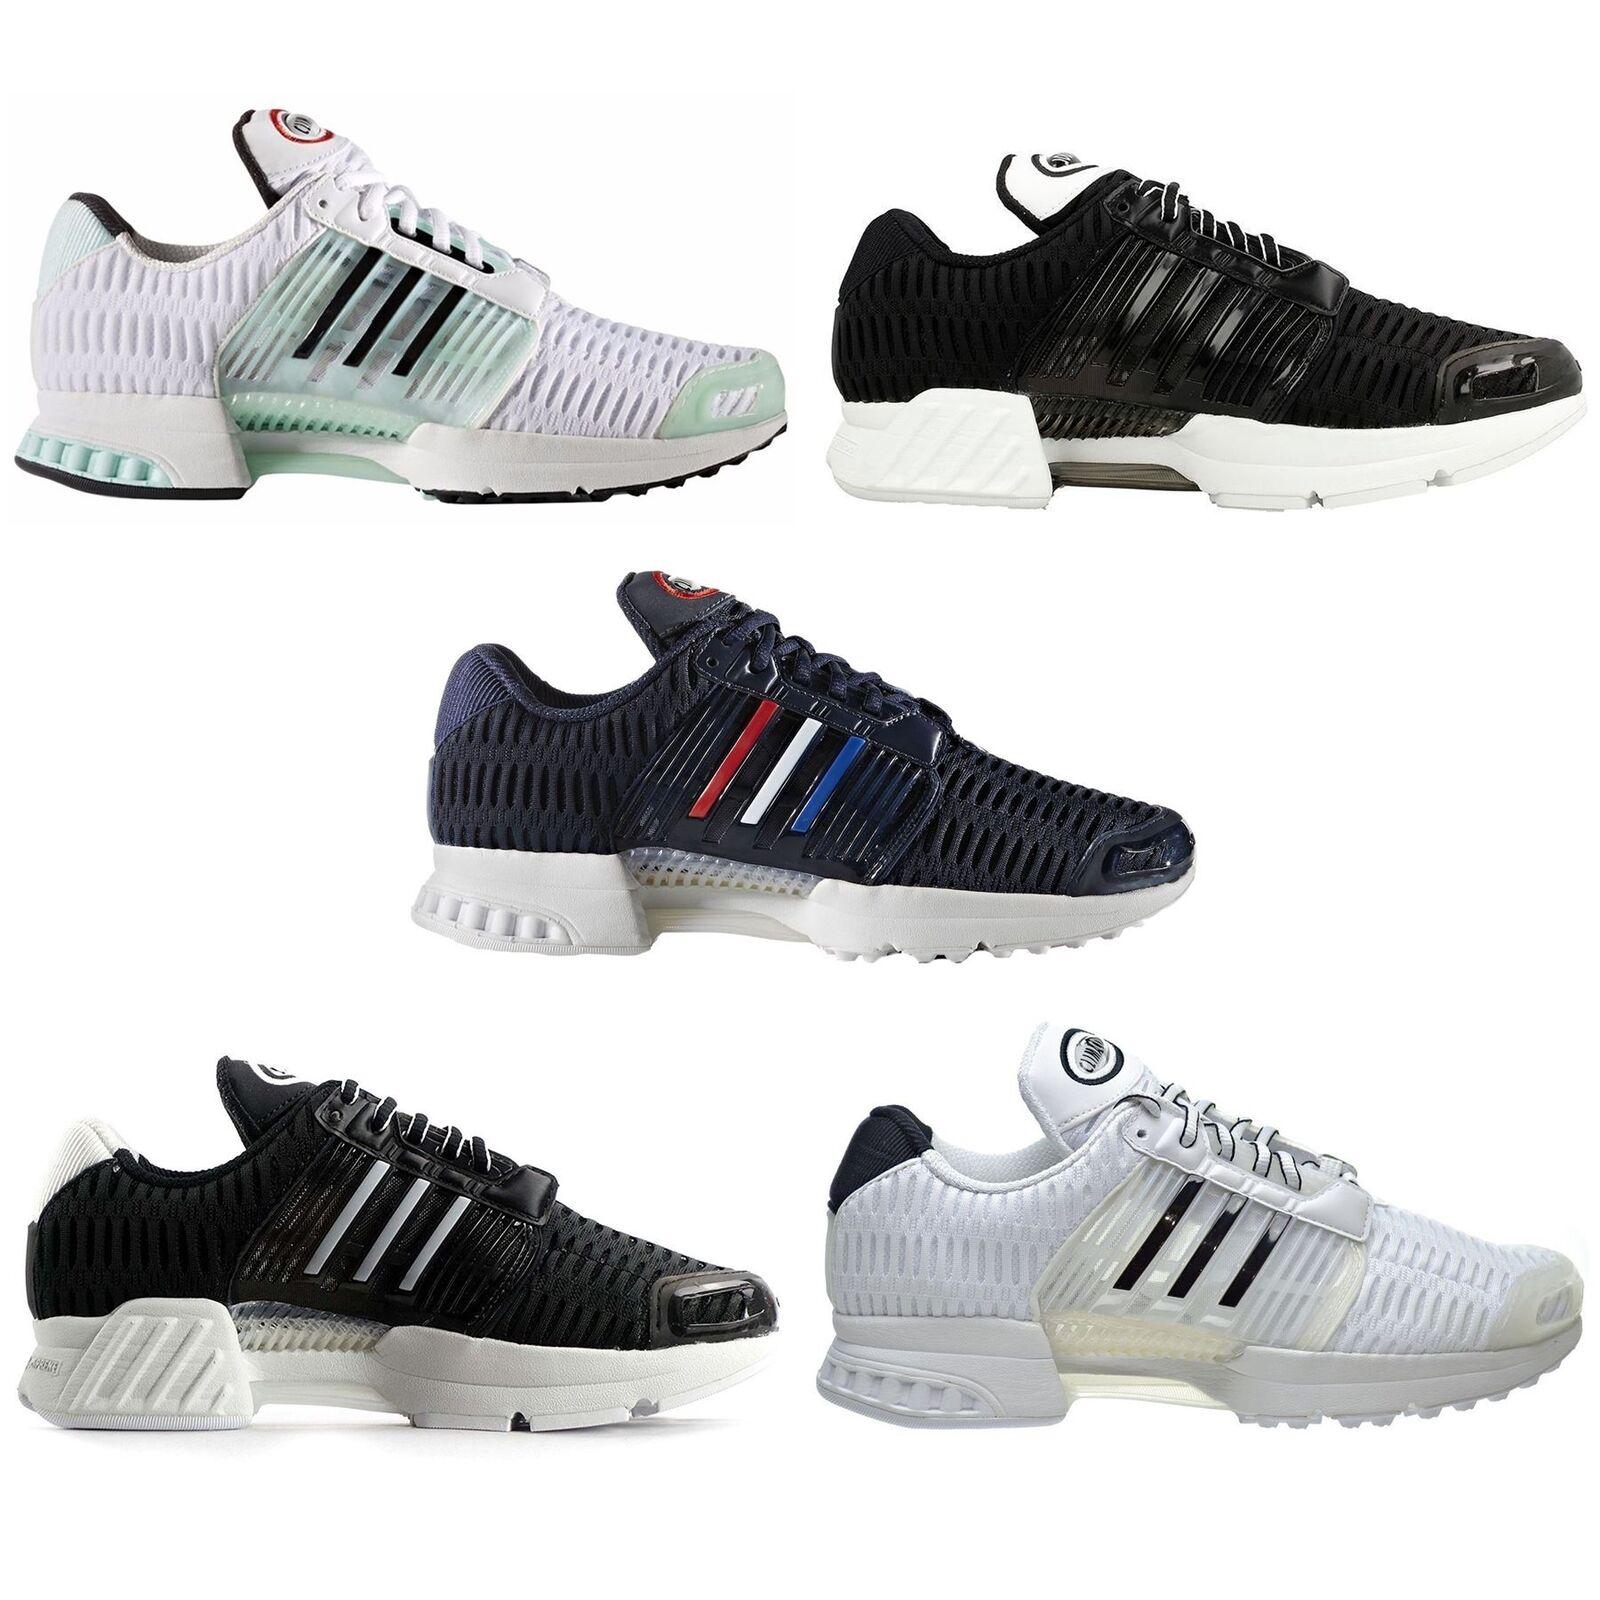 ADIDAS originaux climacool Baskets Homme/femme JUNIORS Chaussures baskets baskets Chaussures a6bb16